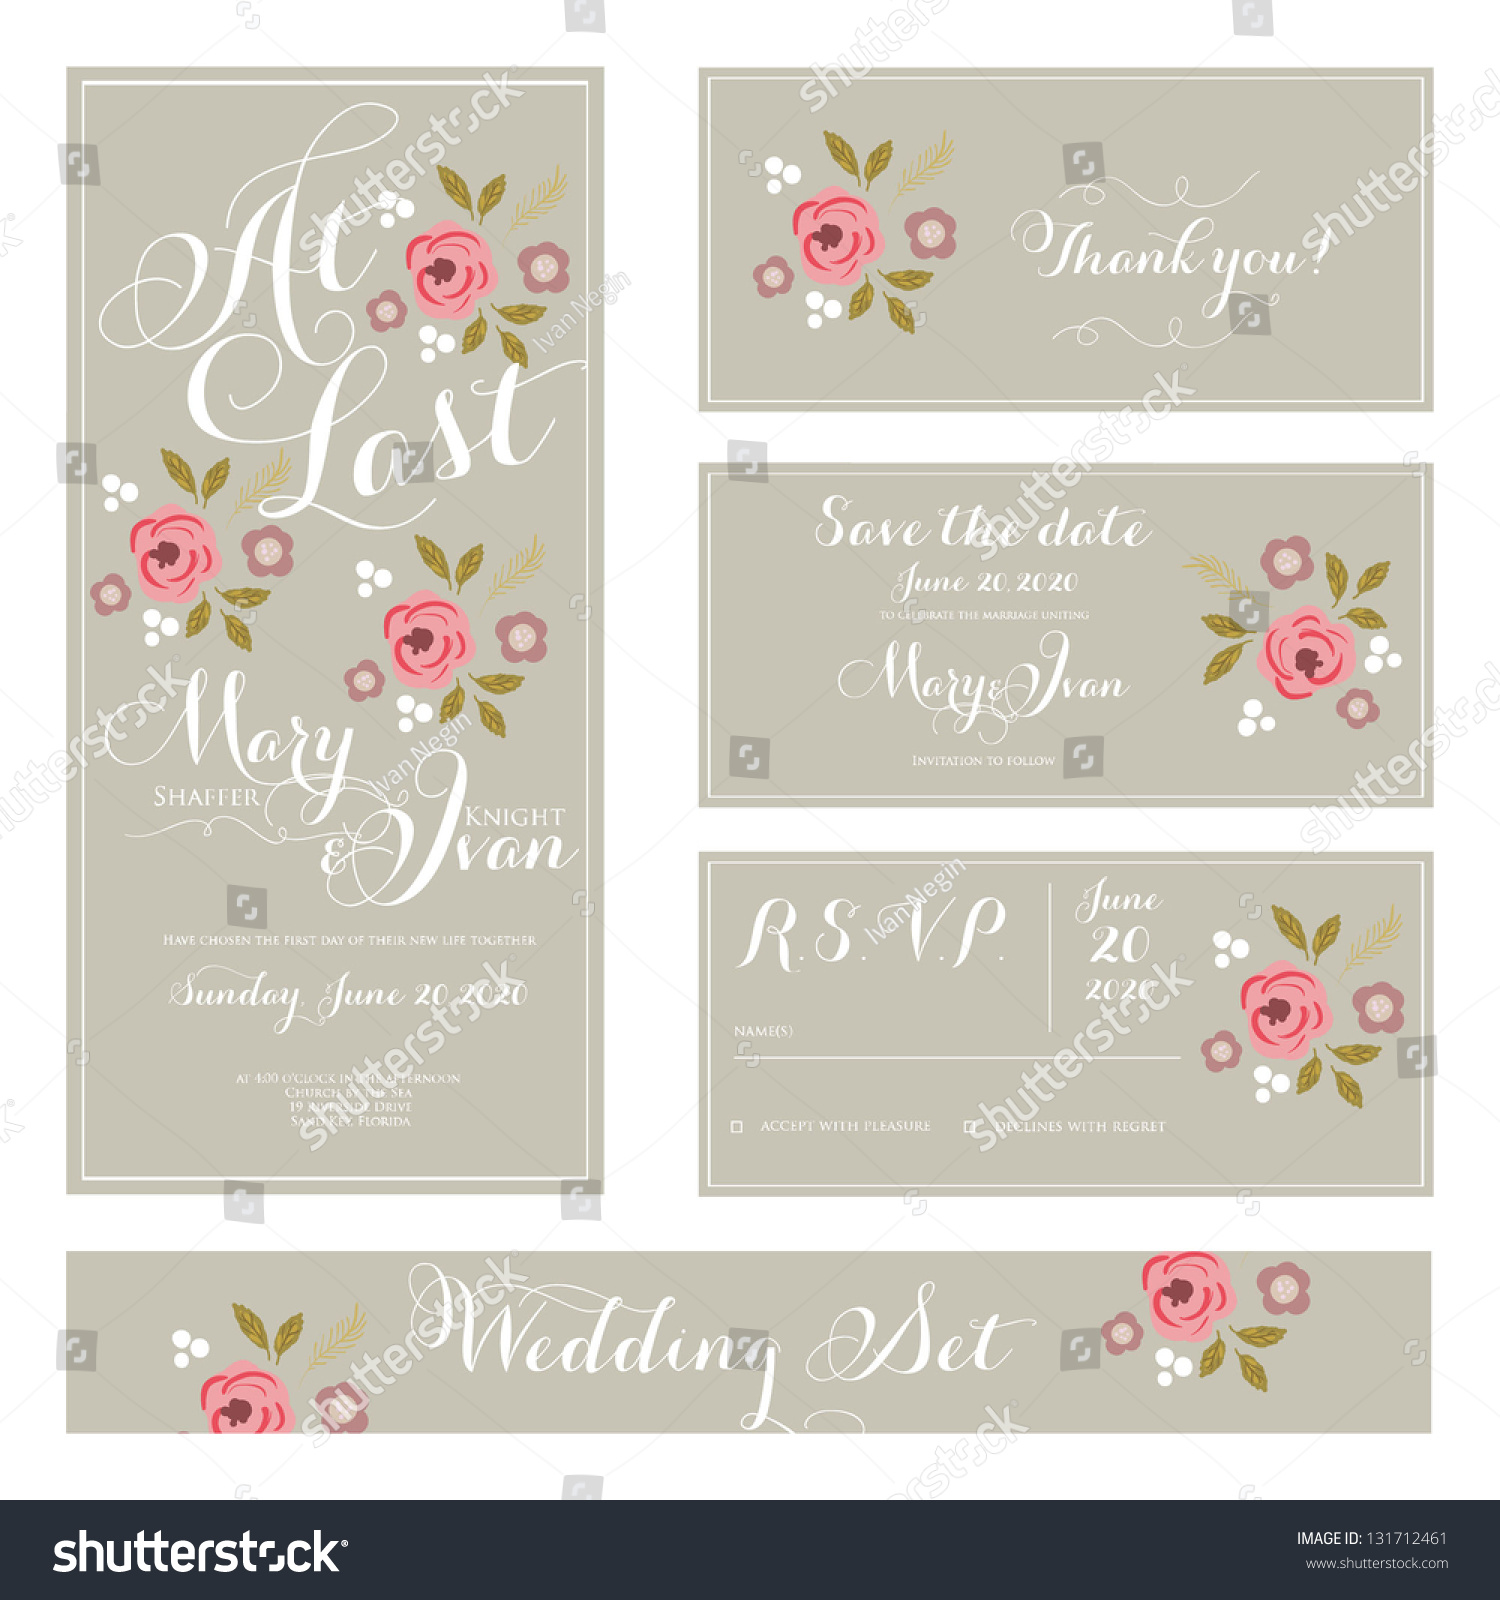 Wedding Gift Thank You Card Etiquette : 12751650: Thank You Card Etiquette WeddingWedding Gift Thank You ...